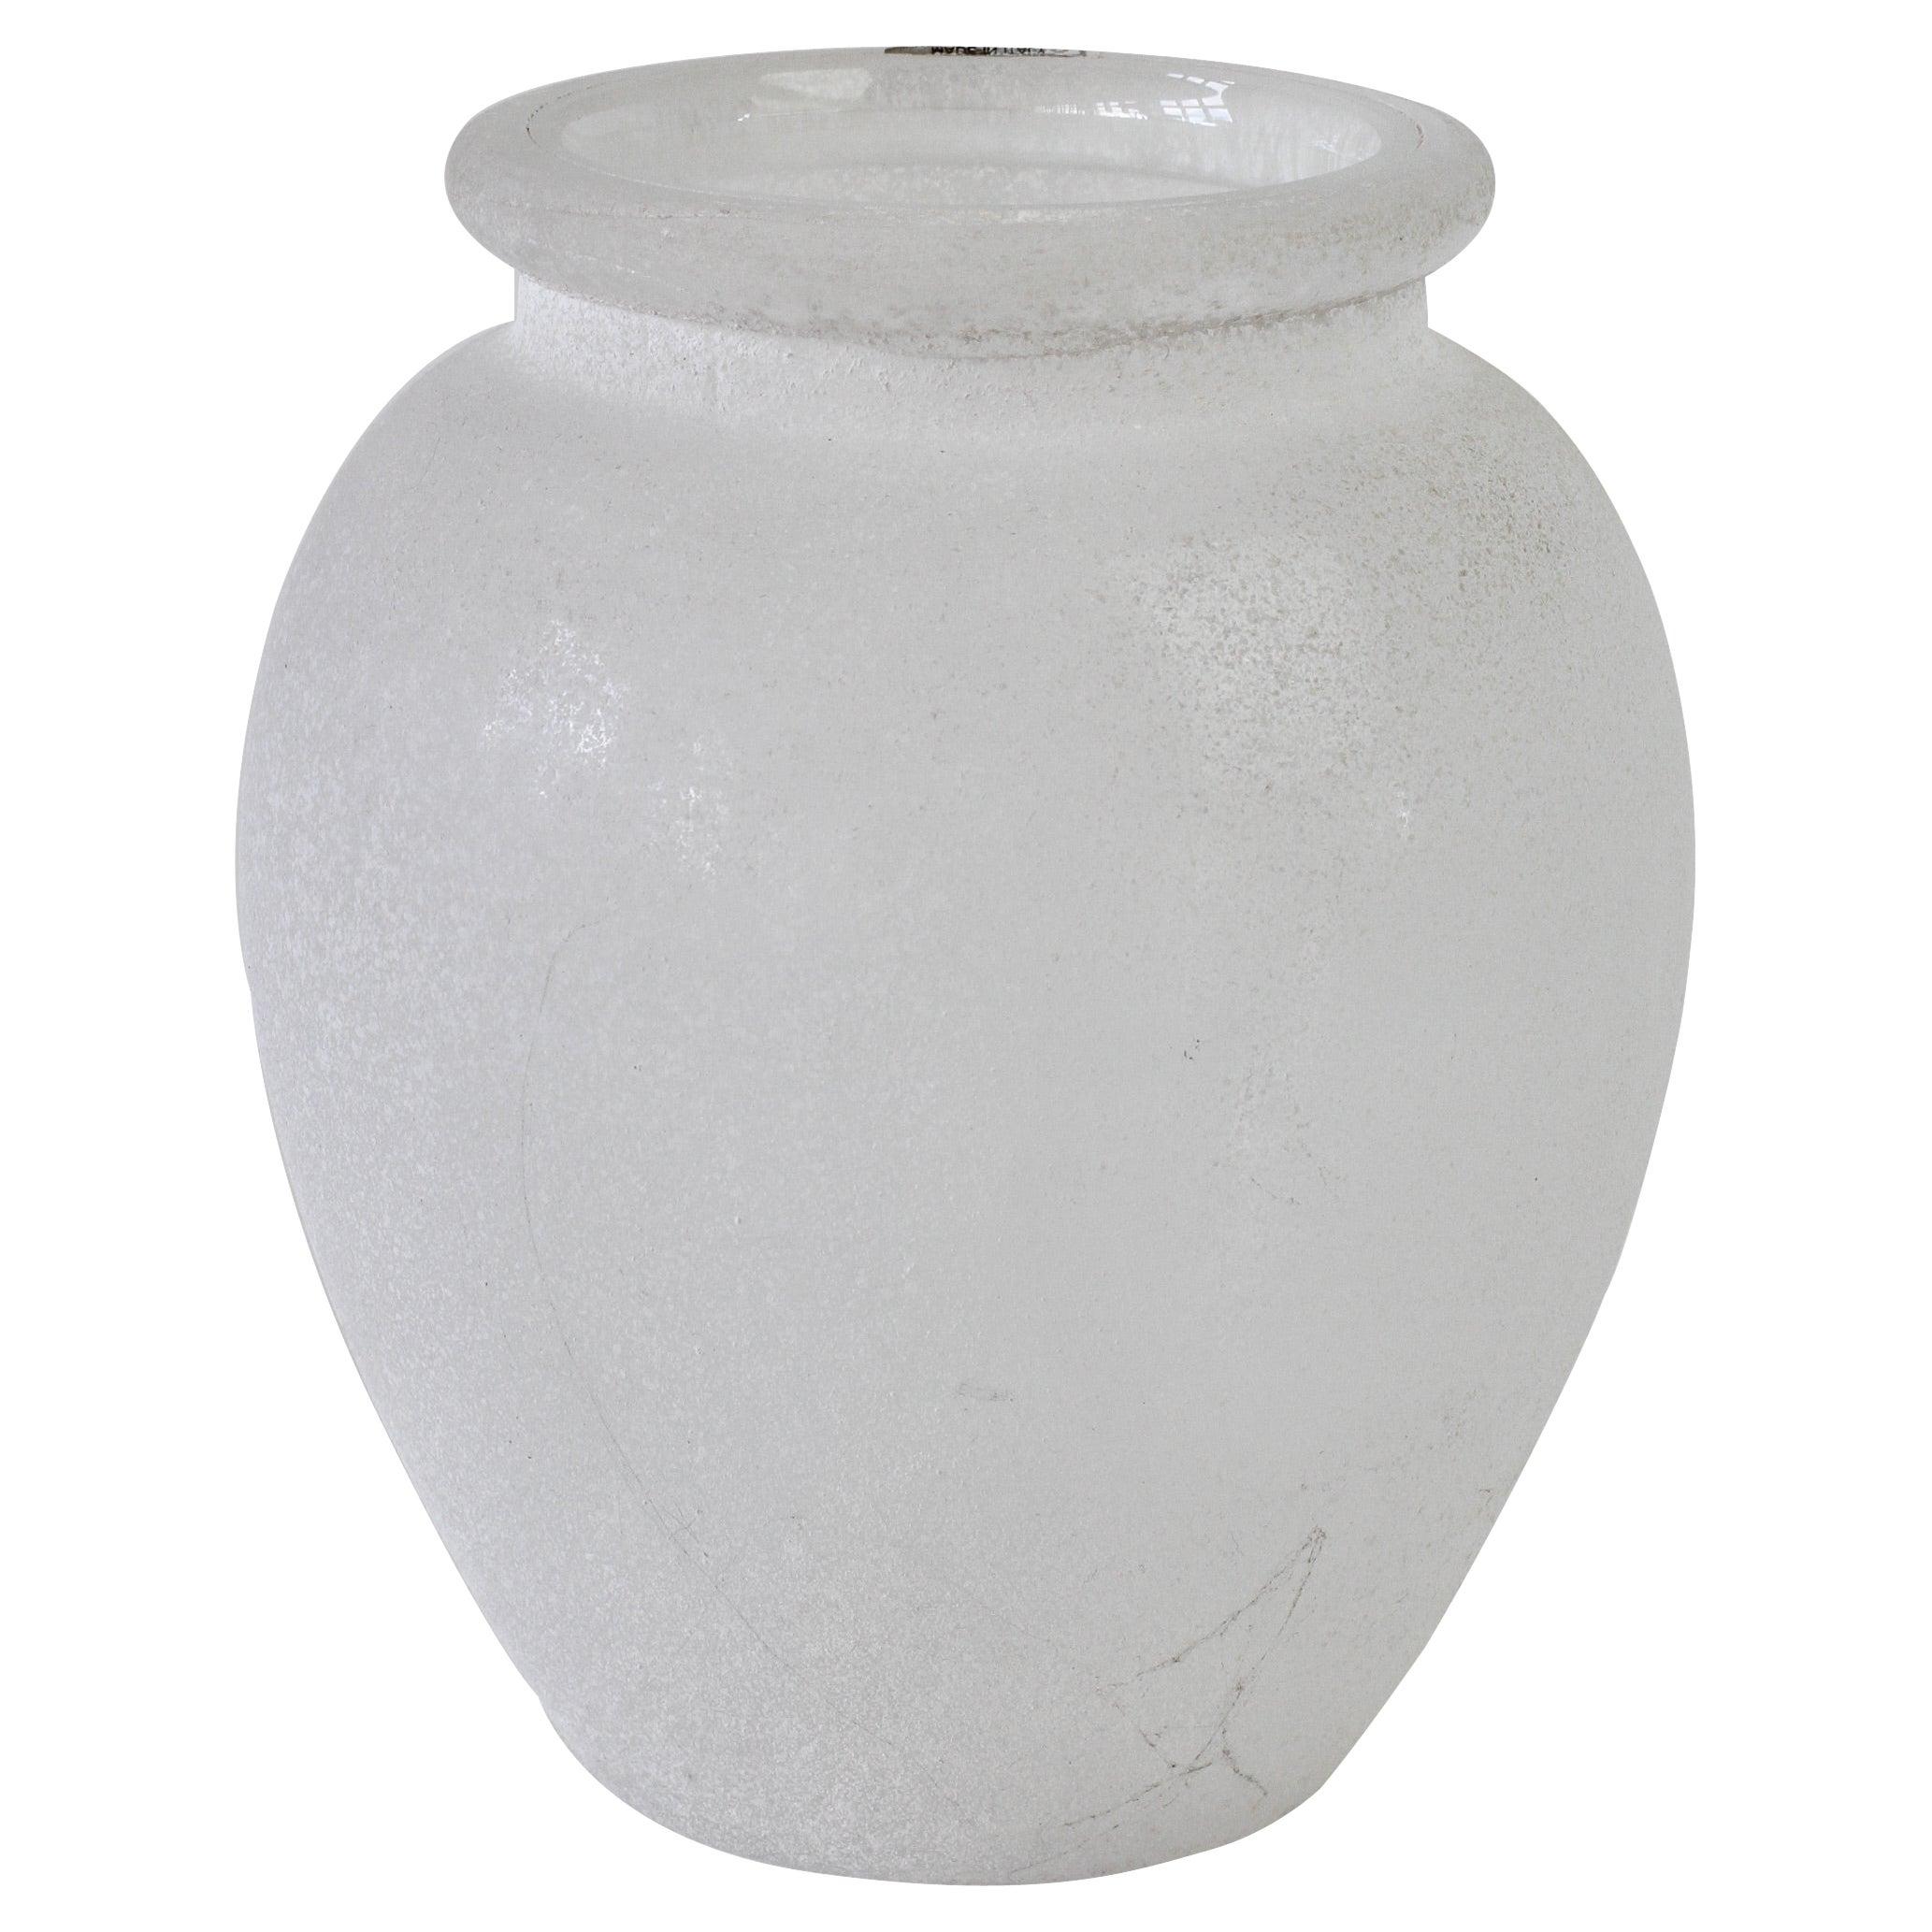 Seguso Vetri d'Arte Vintage Elegant White 'a Scavo' Murano Glass Vase Italy